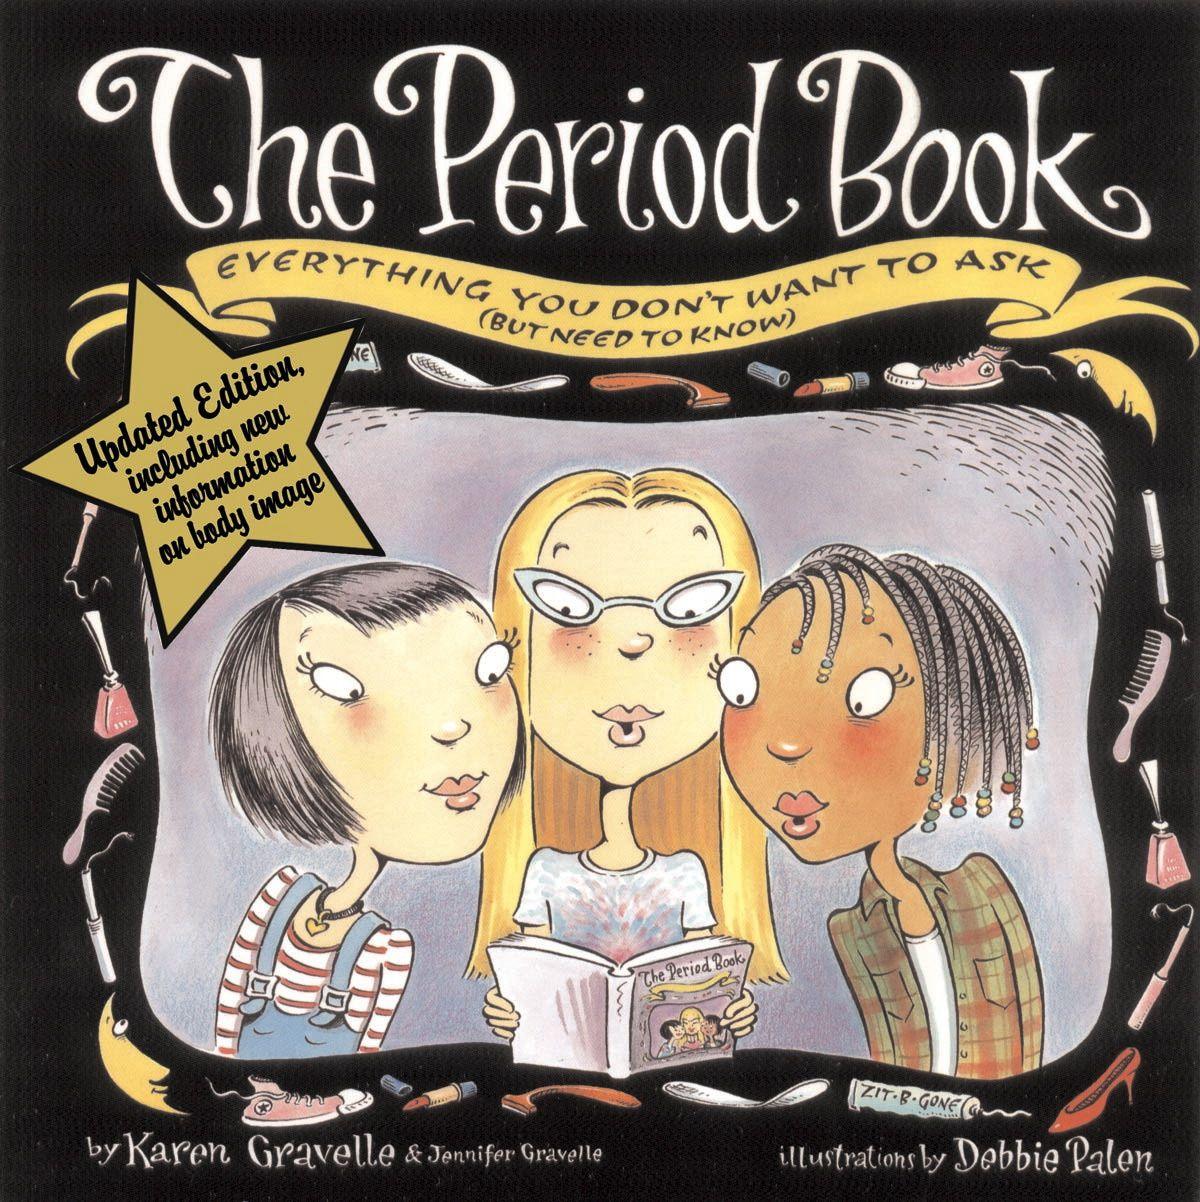 Puberty Resources For Tween Girls